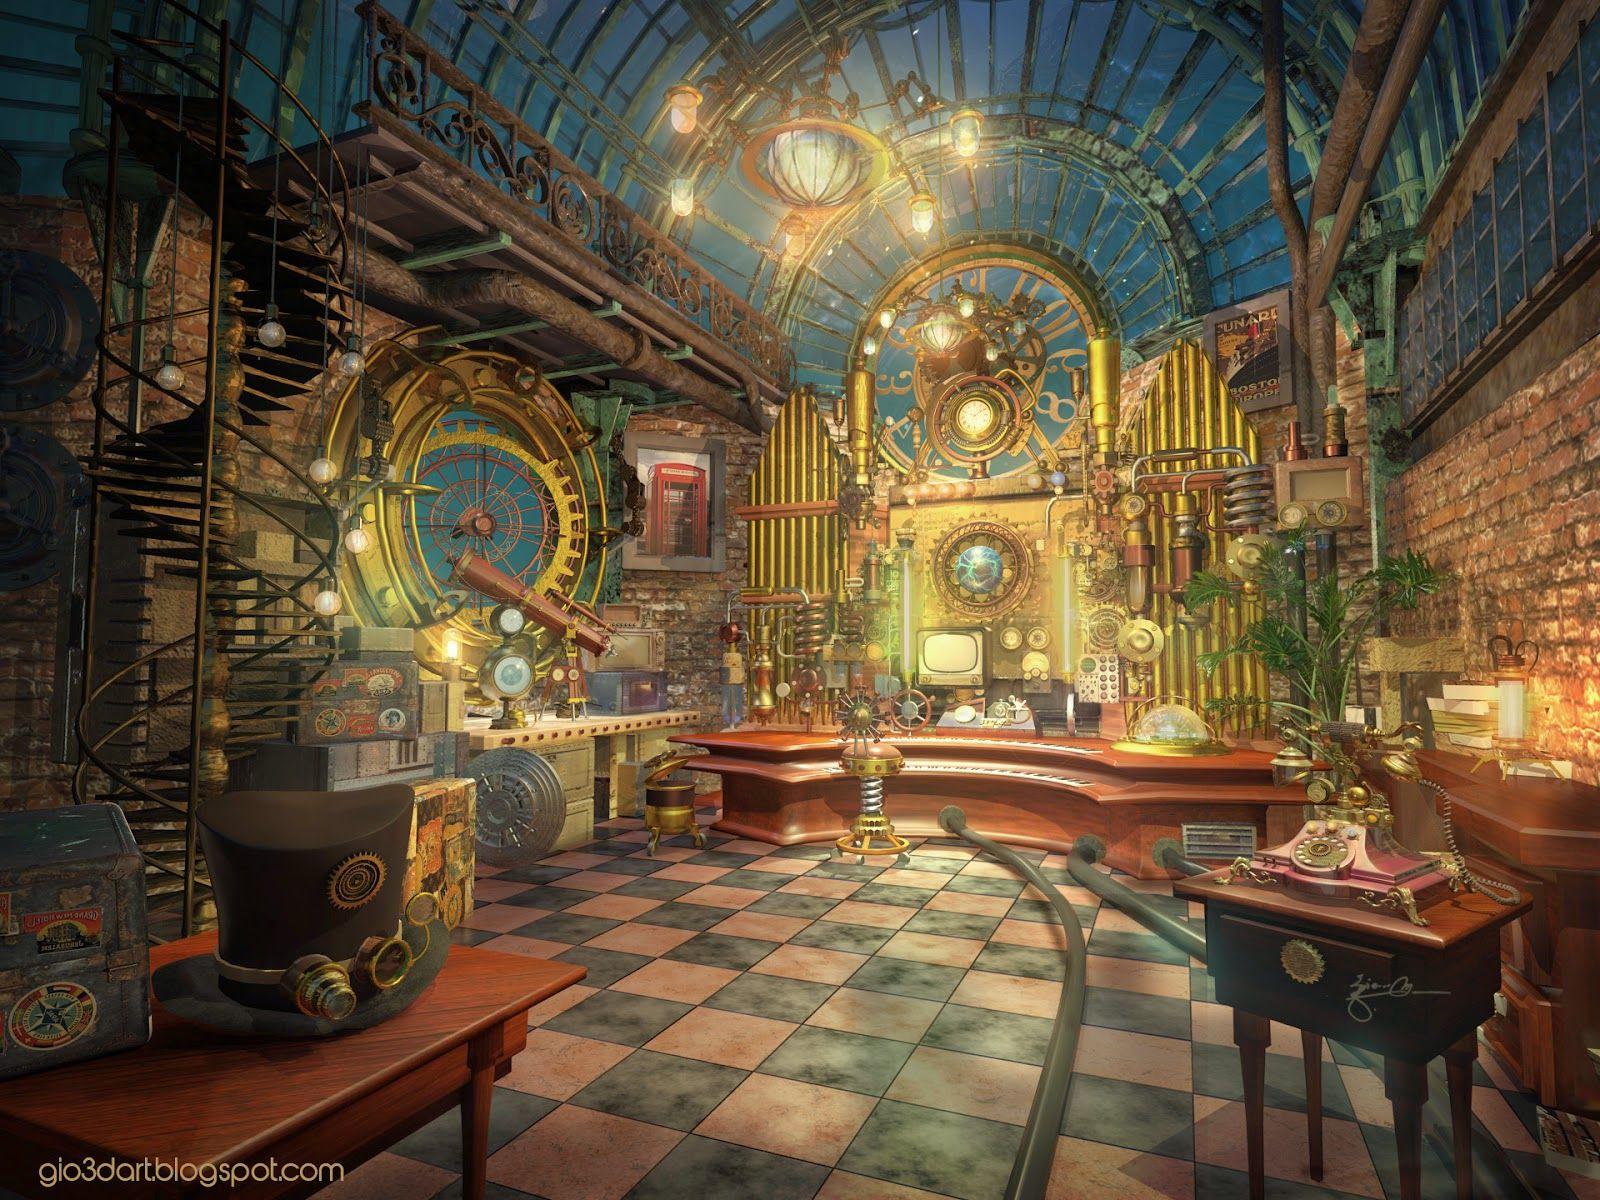 Concept Art Room Steampunk Google 検索 디자인 배경 배경화면 및 디자인